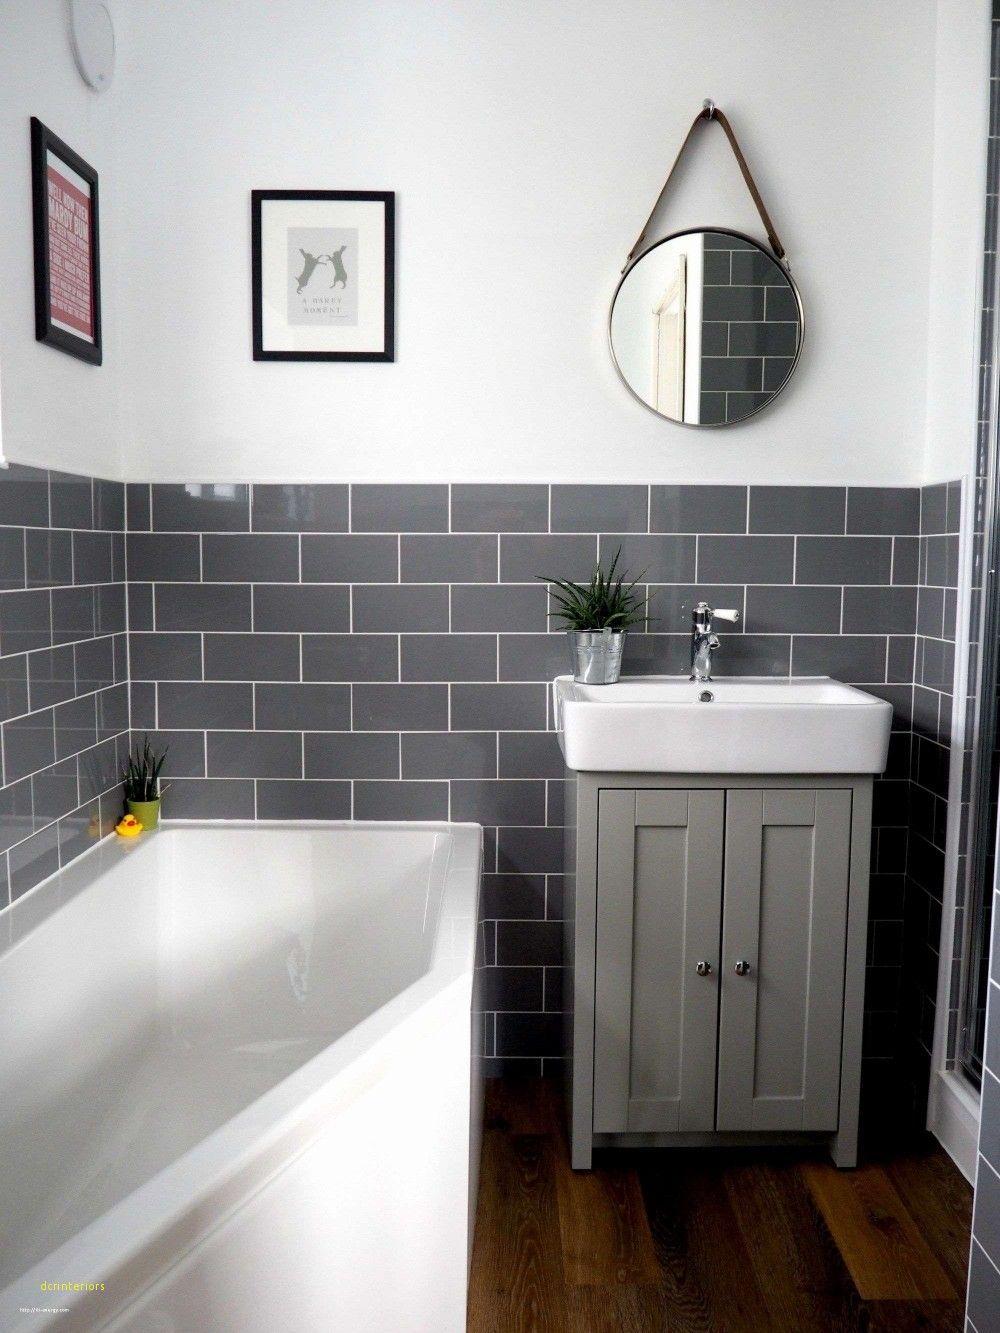 Luxury Bathroom Design Ideas With Grey Tiles Home Decor Bathroom Remodel Cost Bathroom Design Small Simple Bathroom